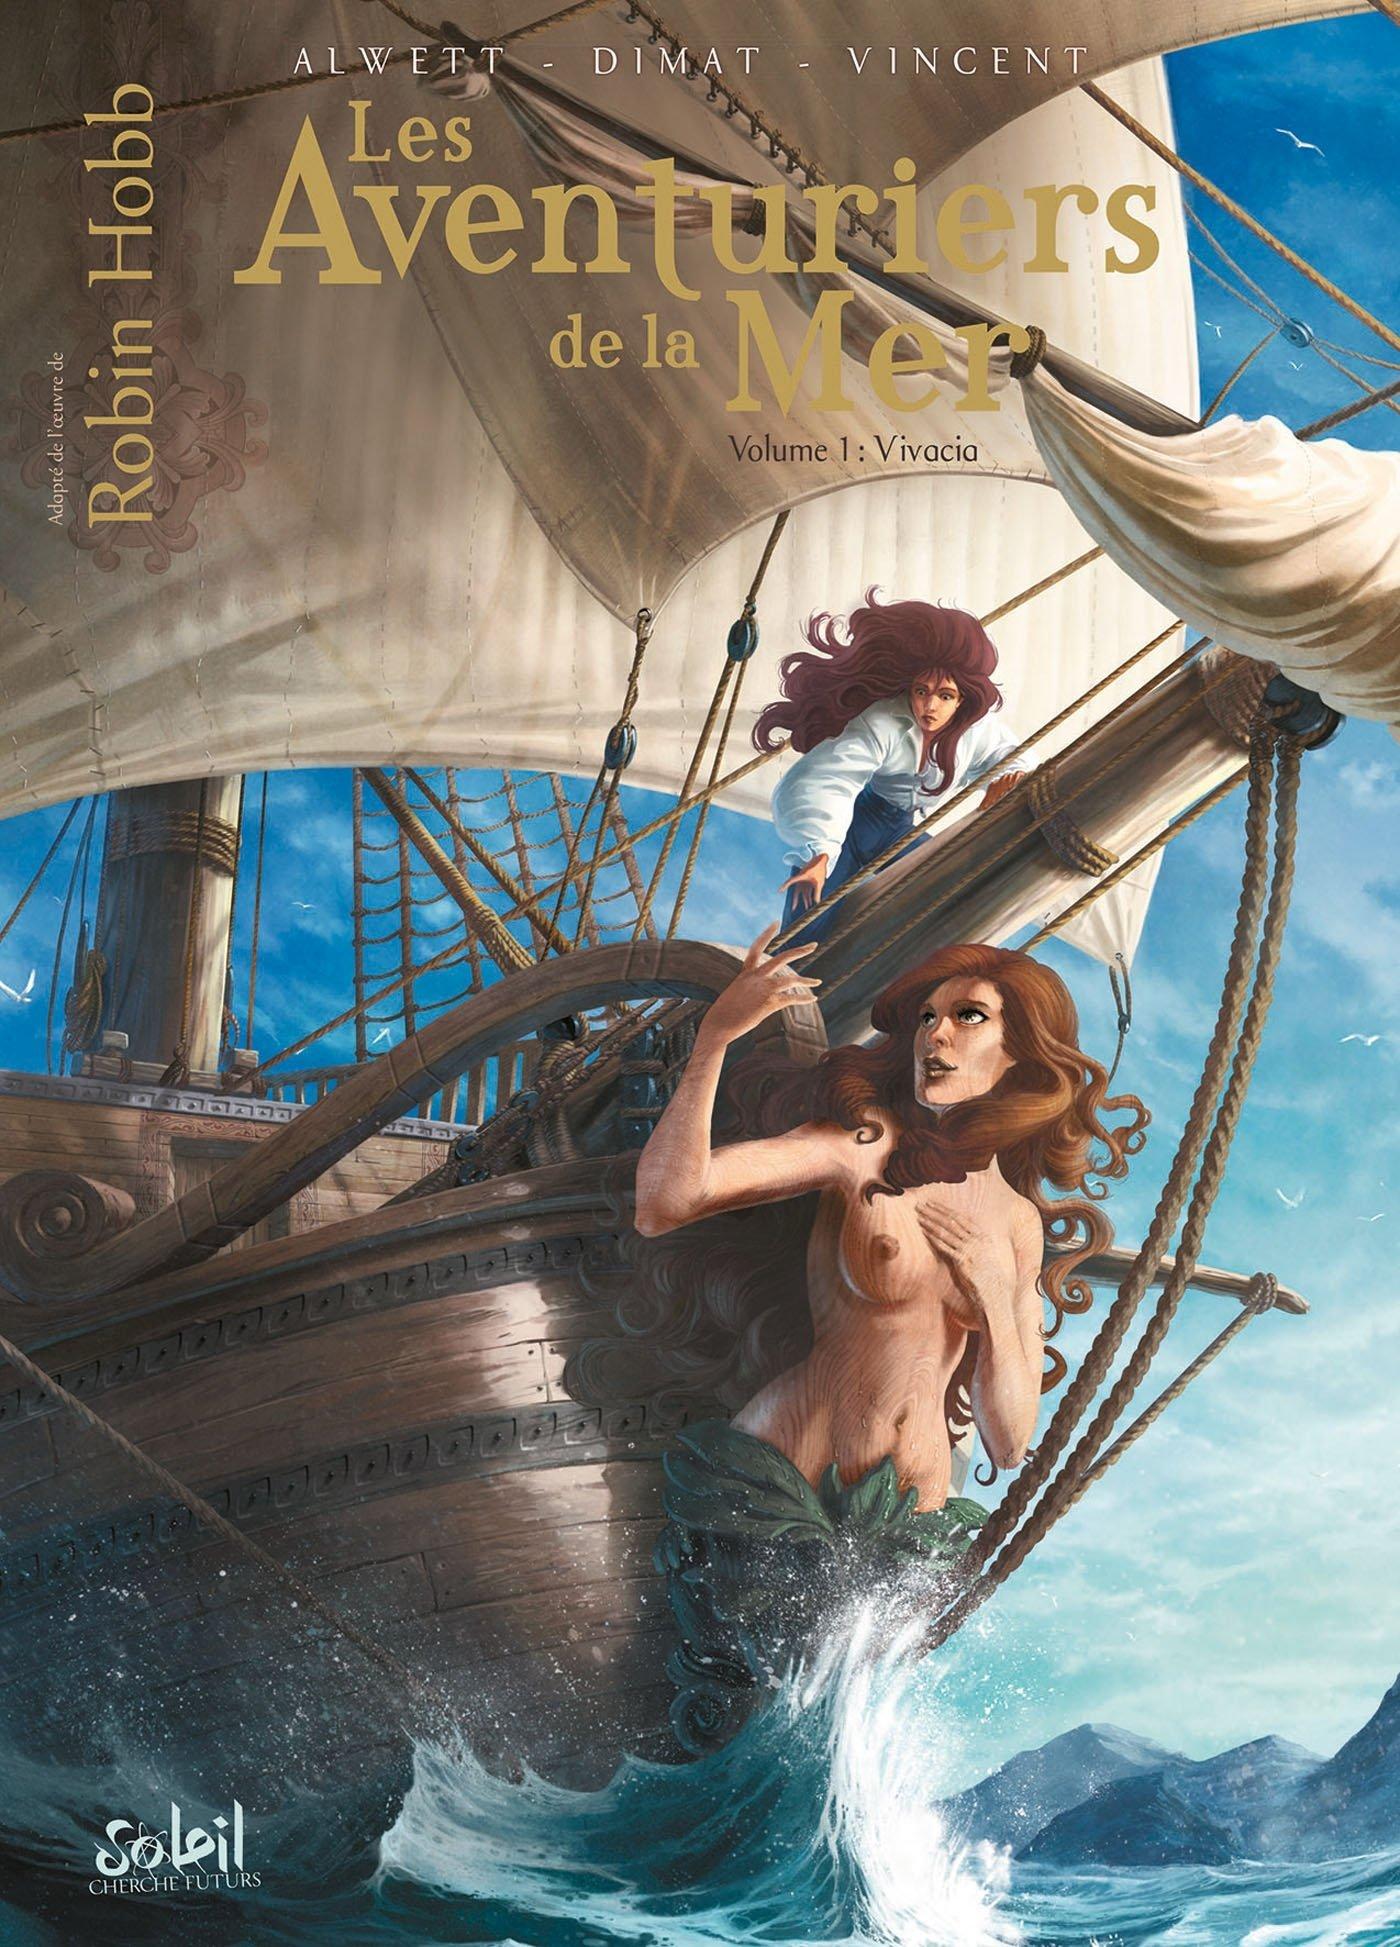 Les aventuriers de la Mer - Tome 1 : Vivacia